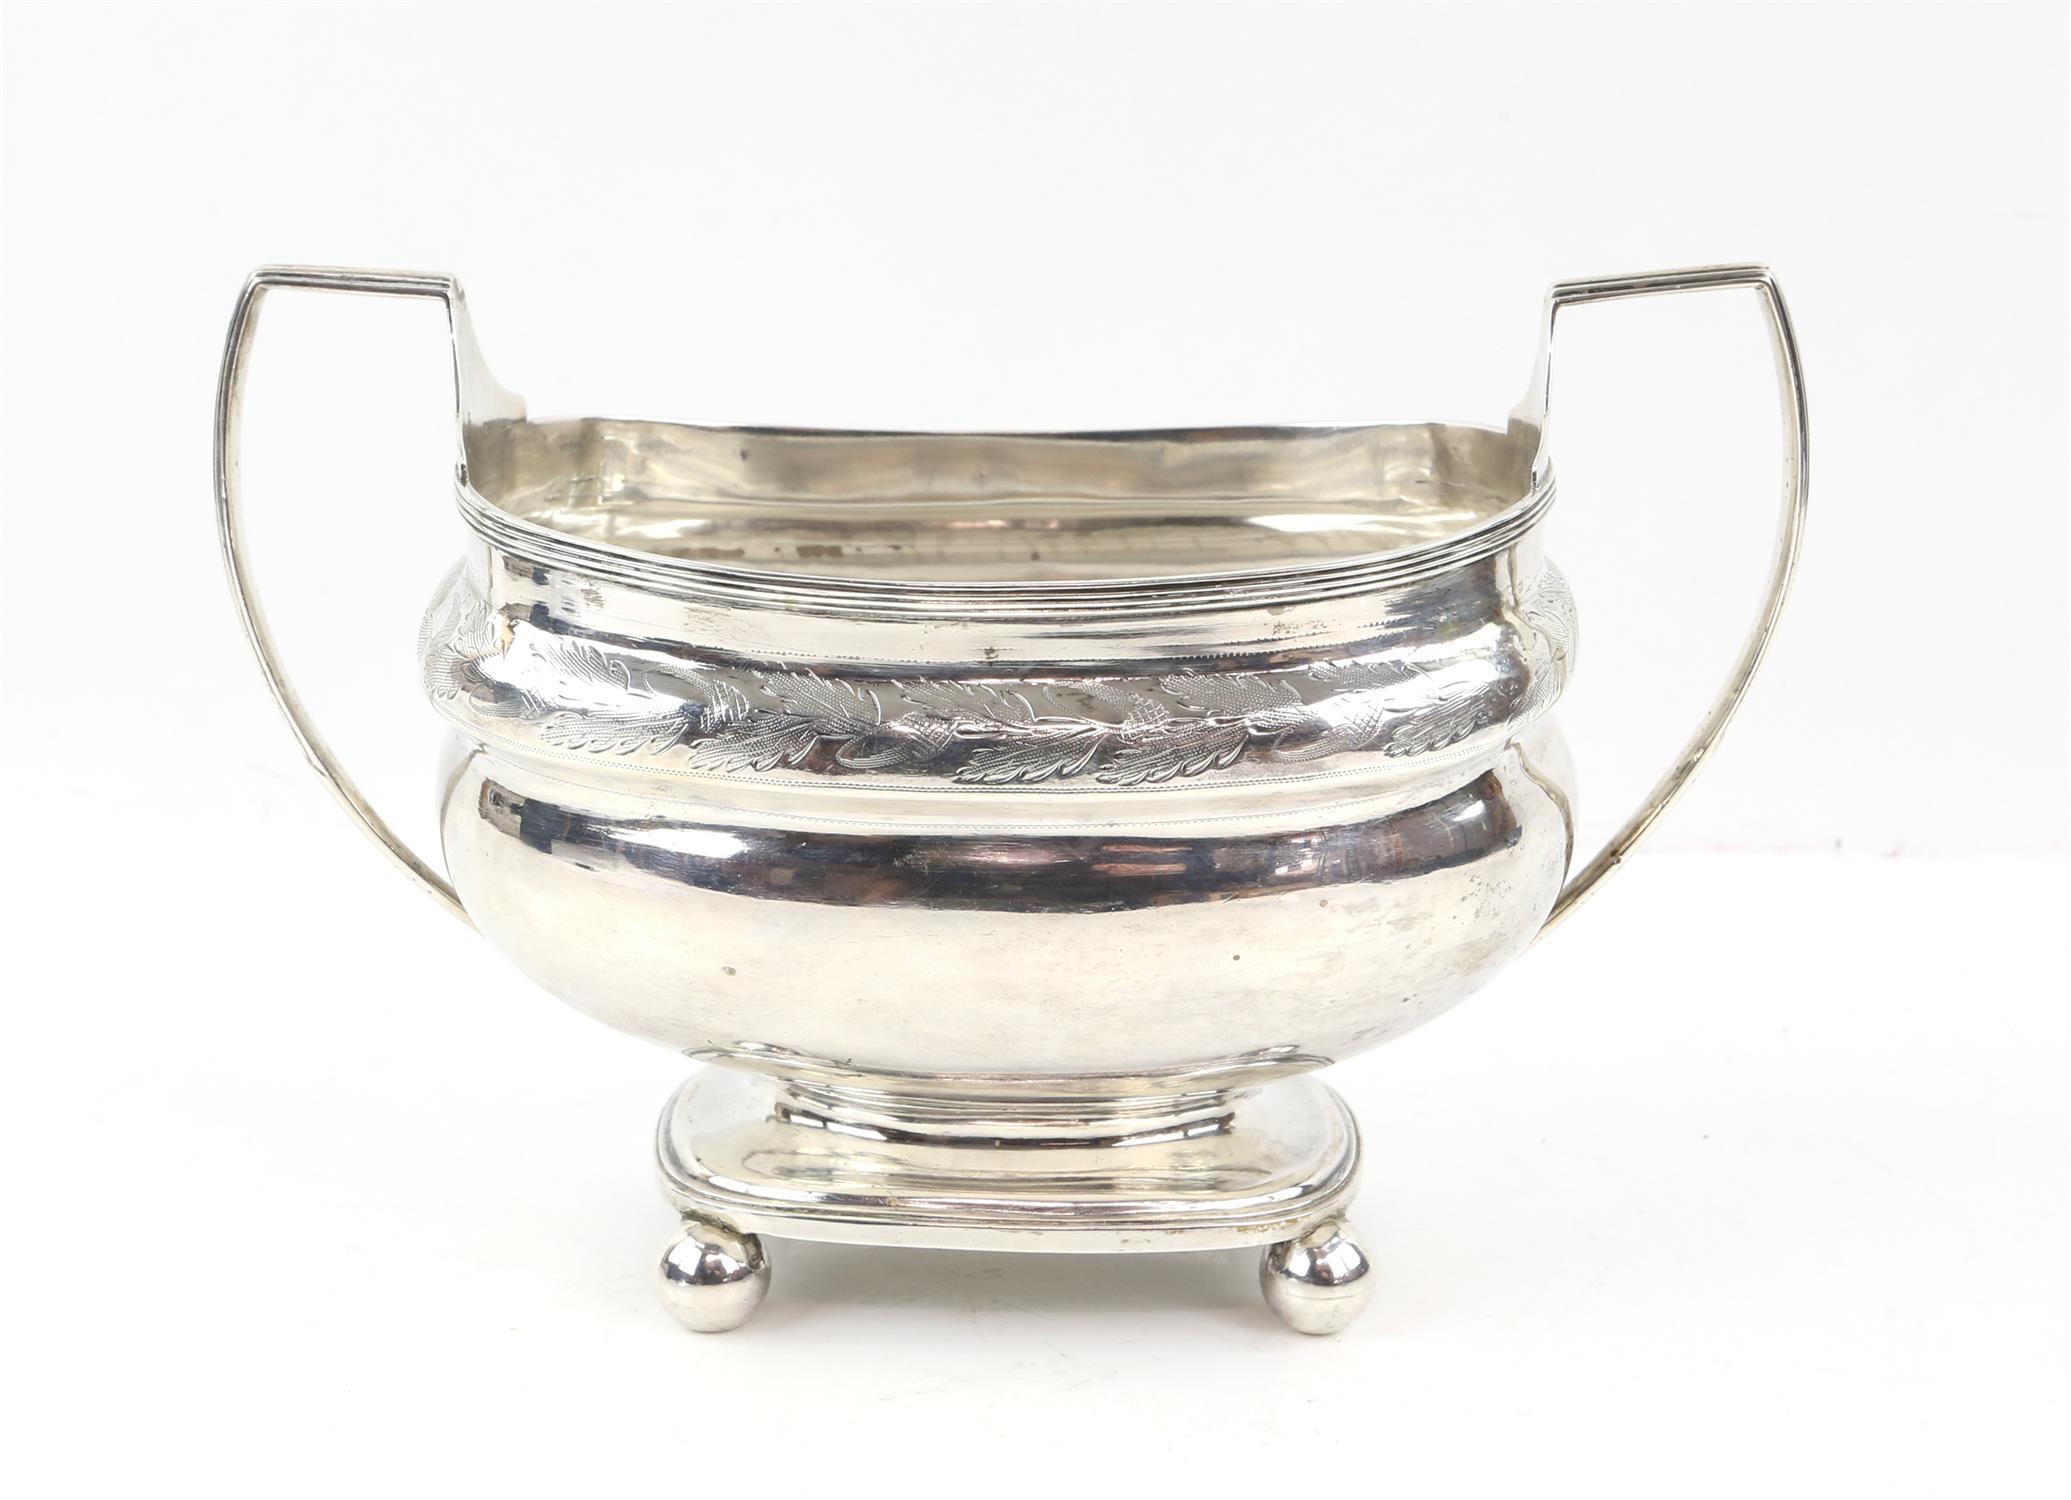 George III two handled sugar bowl with oak leaf band on ball feet, by Ann Robertson Newcastle 1808,